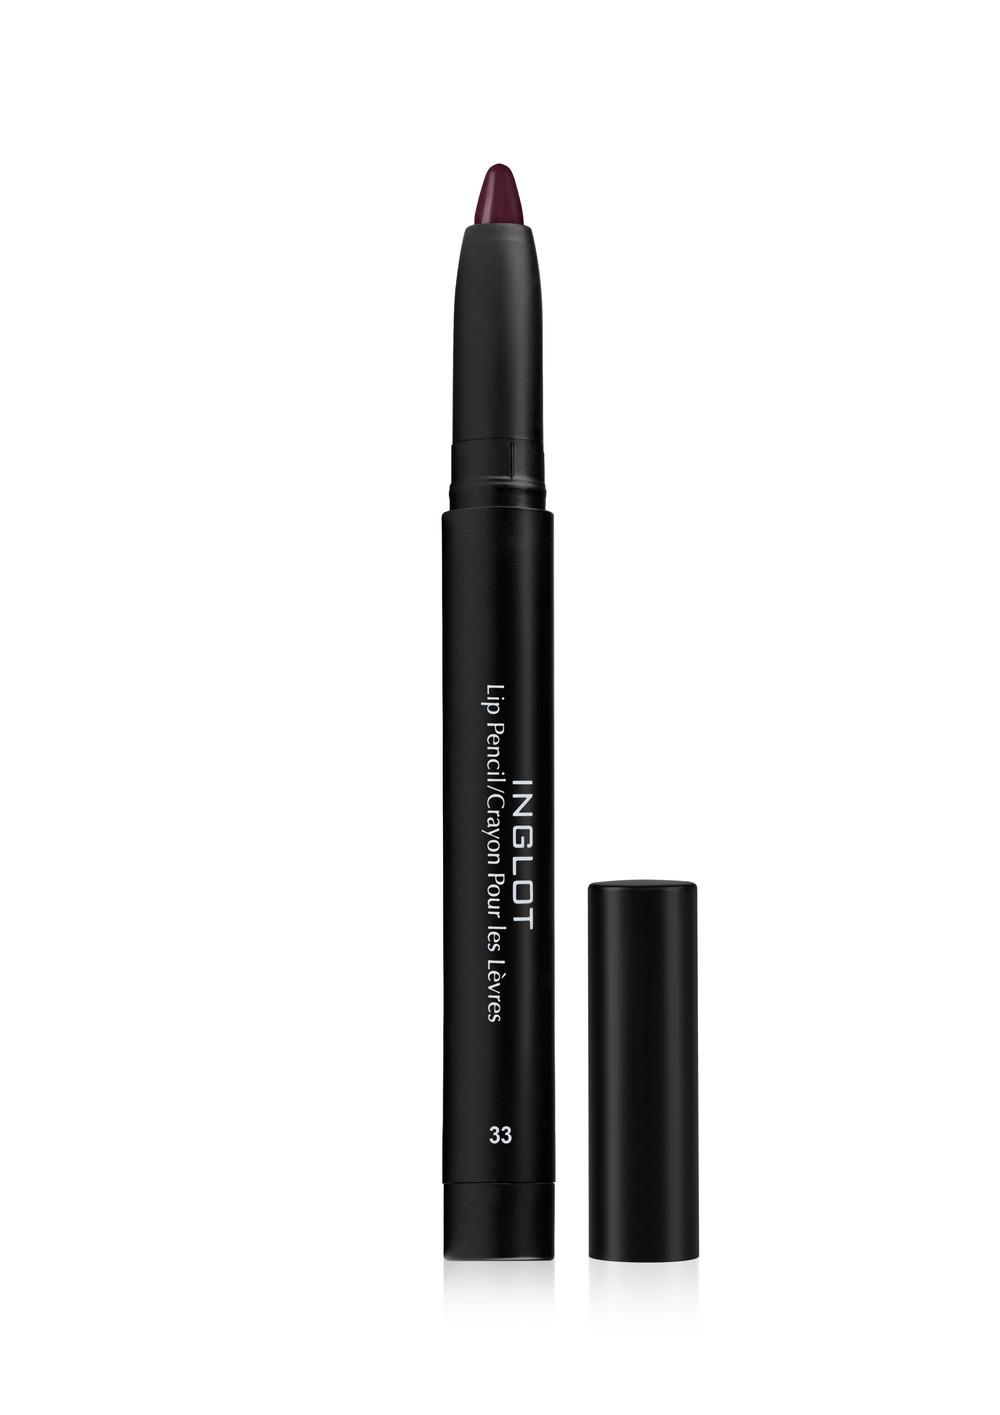 INGLOT amc lip pencil 33.jpg